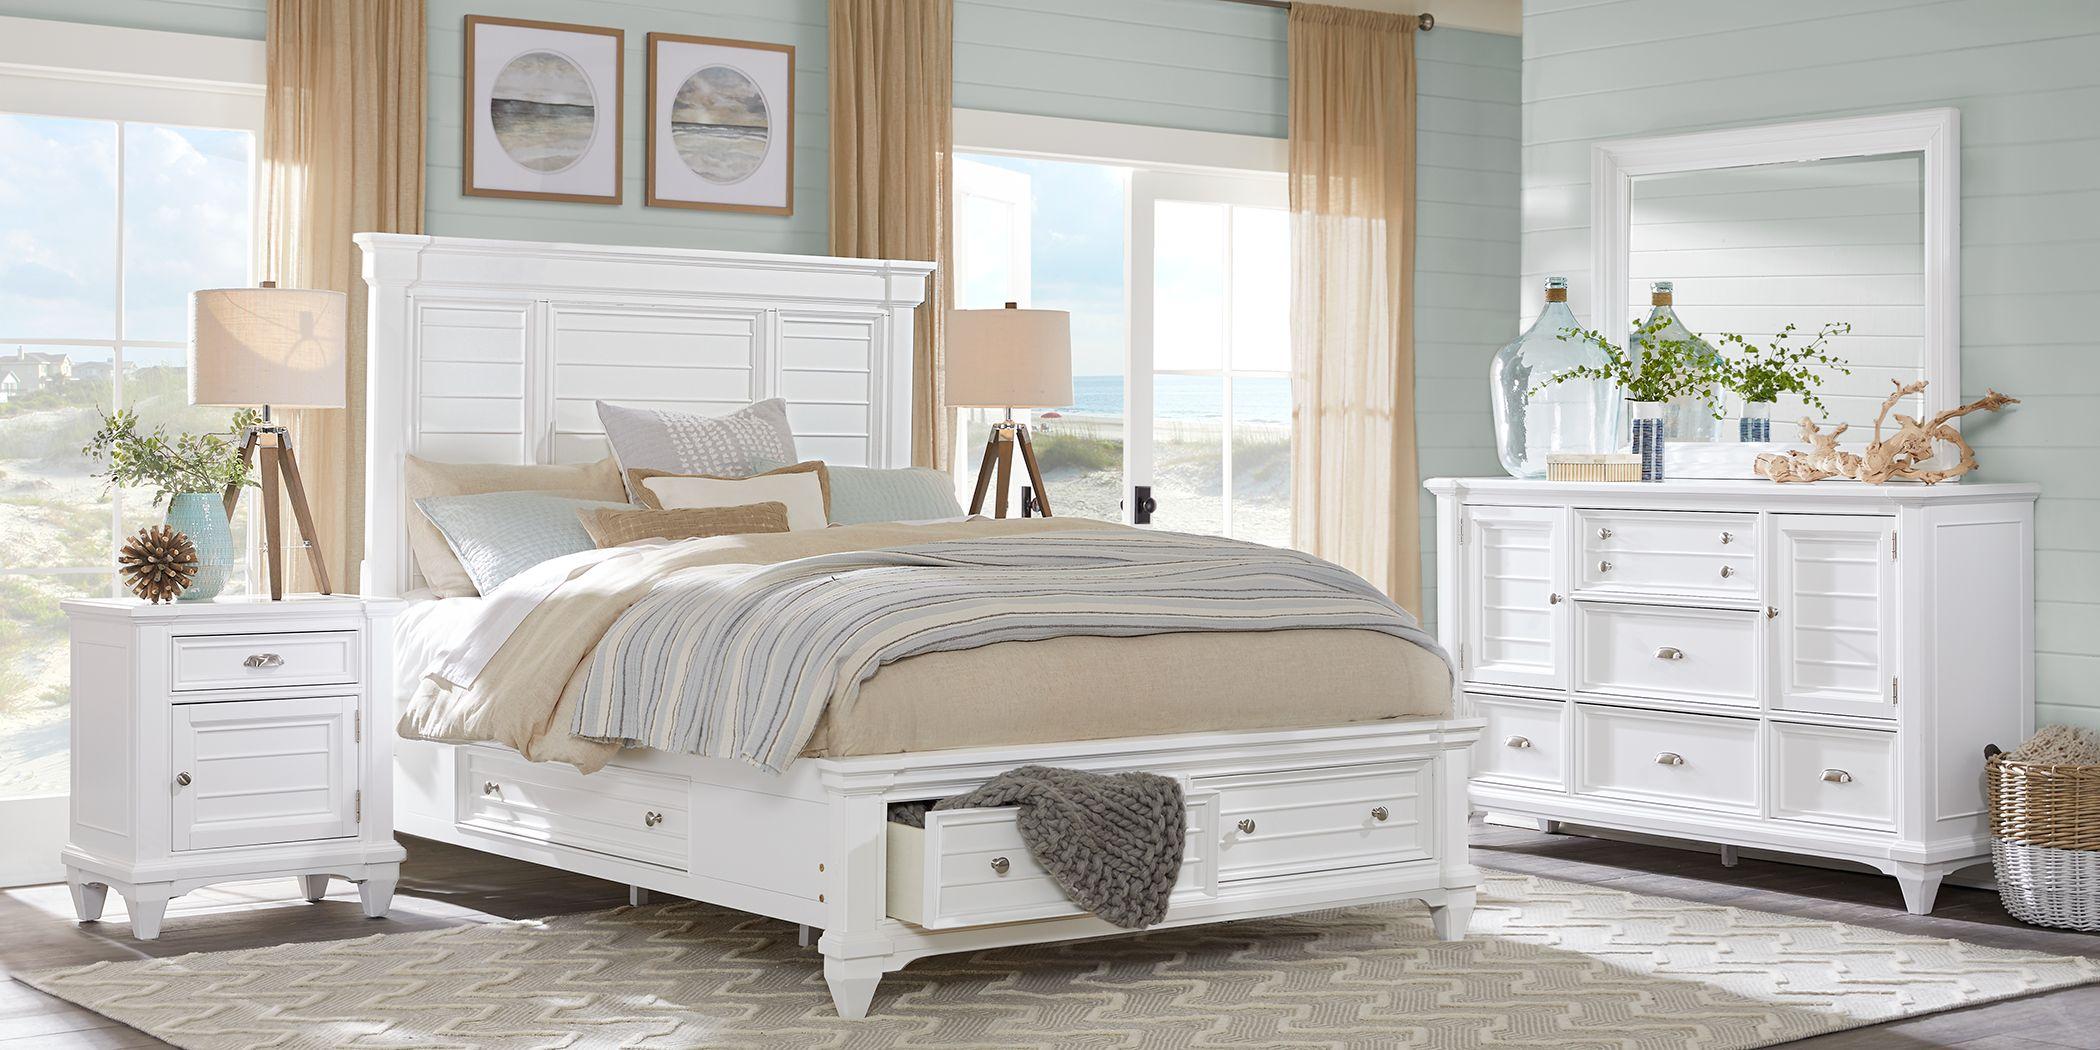 Hilton Head White 5 Pc King Storage Bedroom